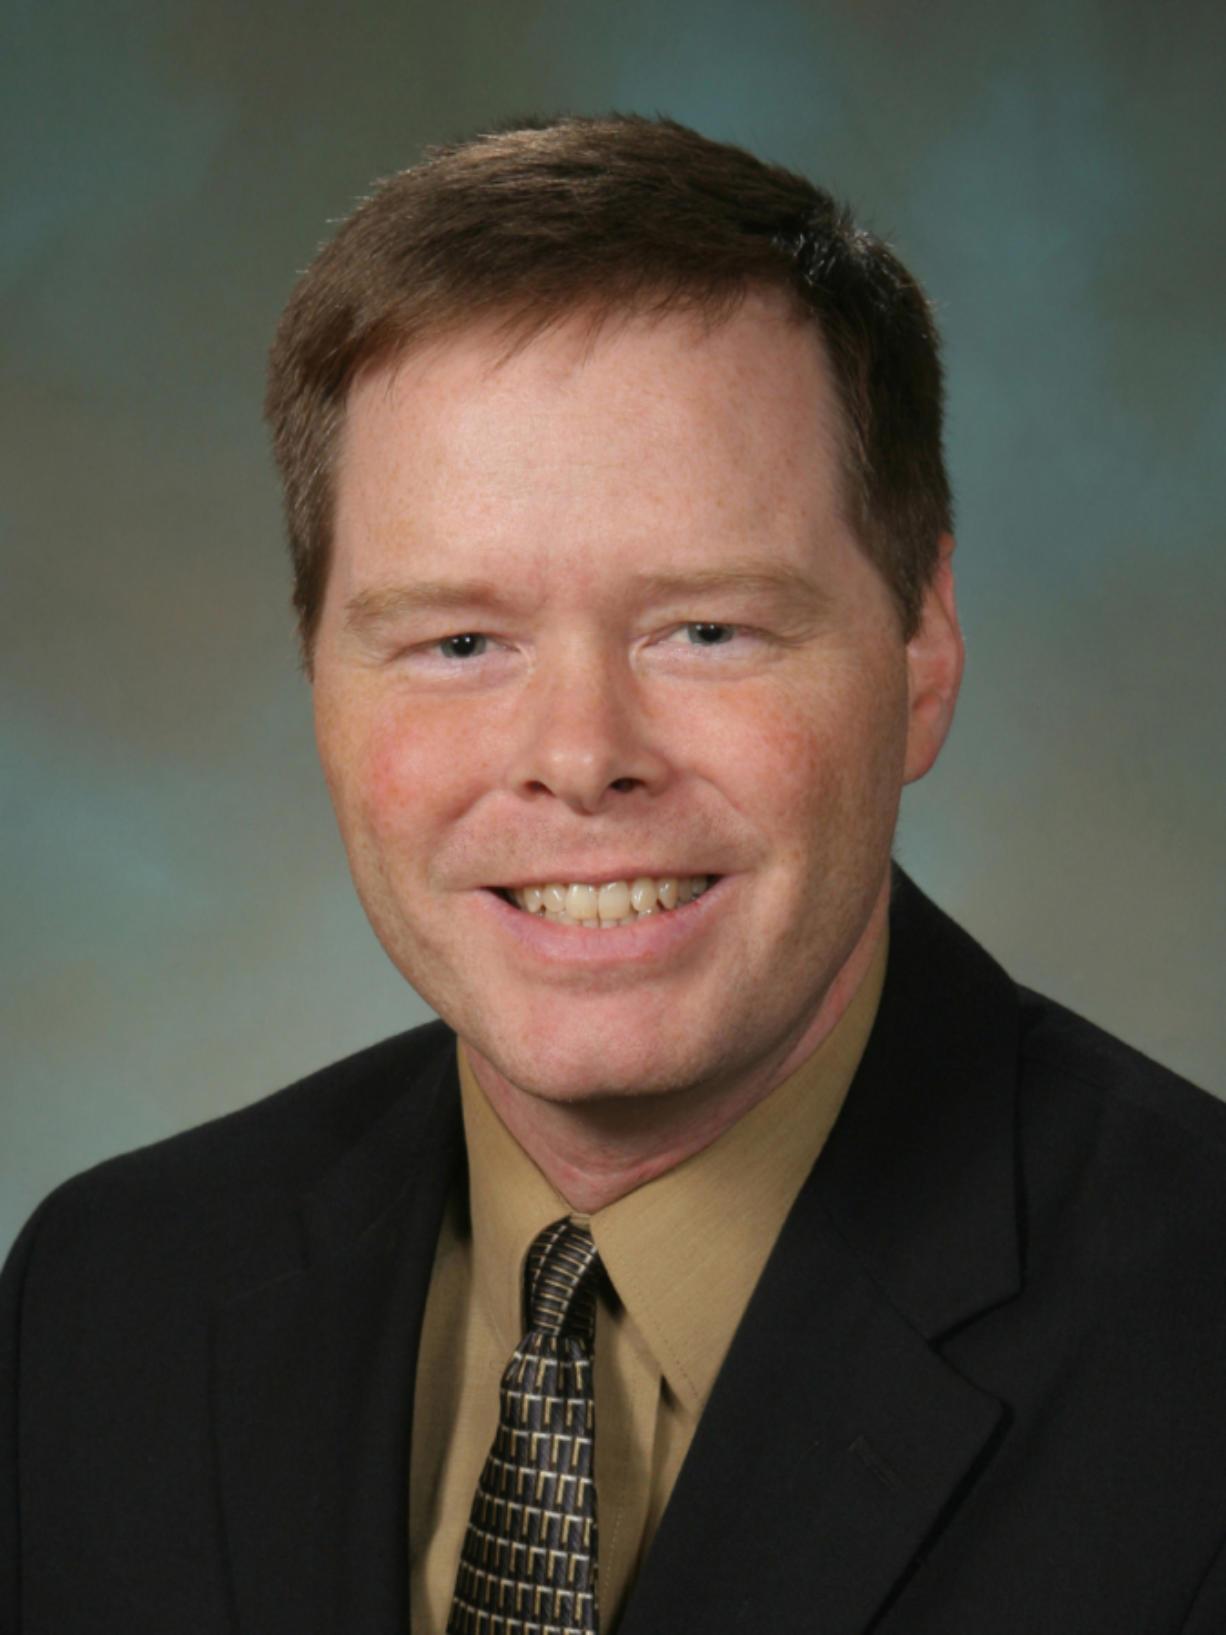 Tim Probst